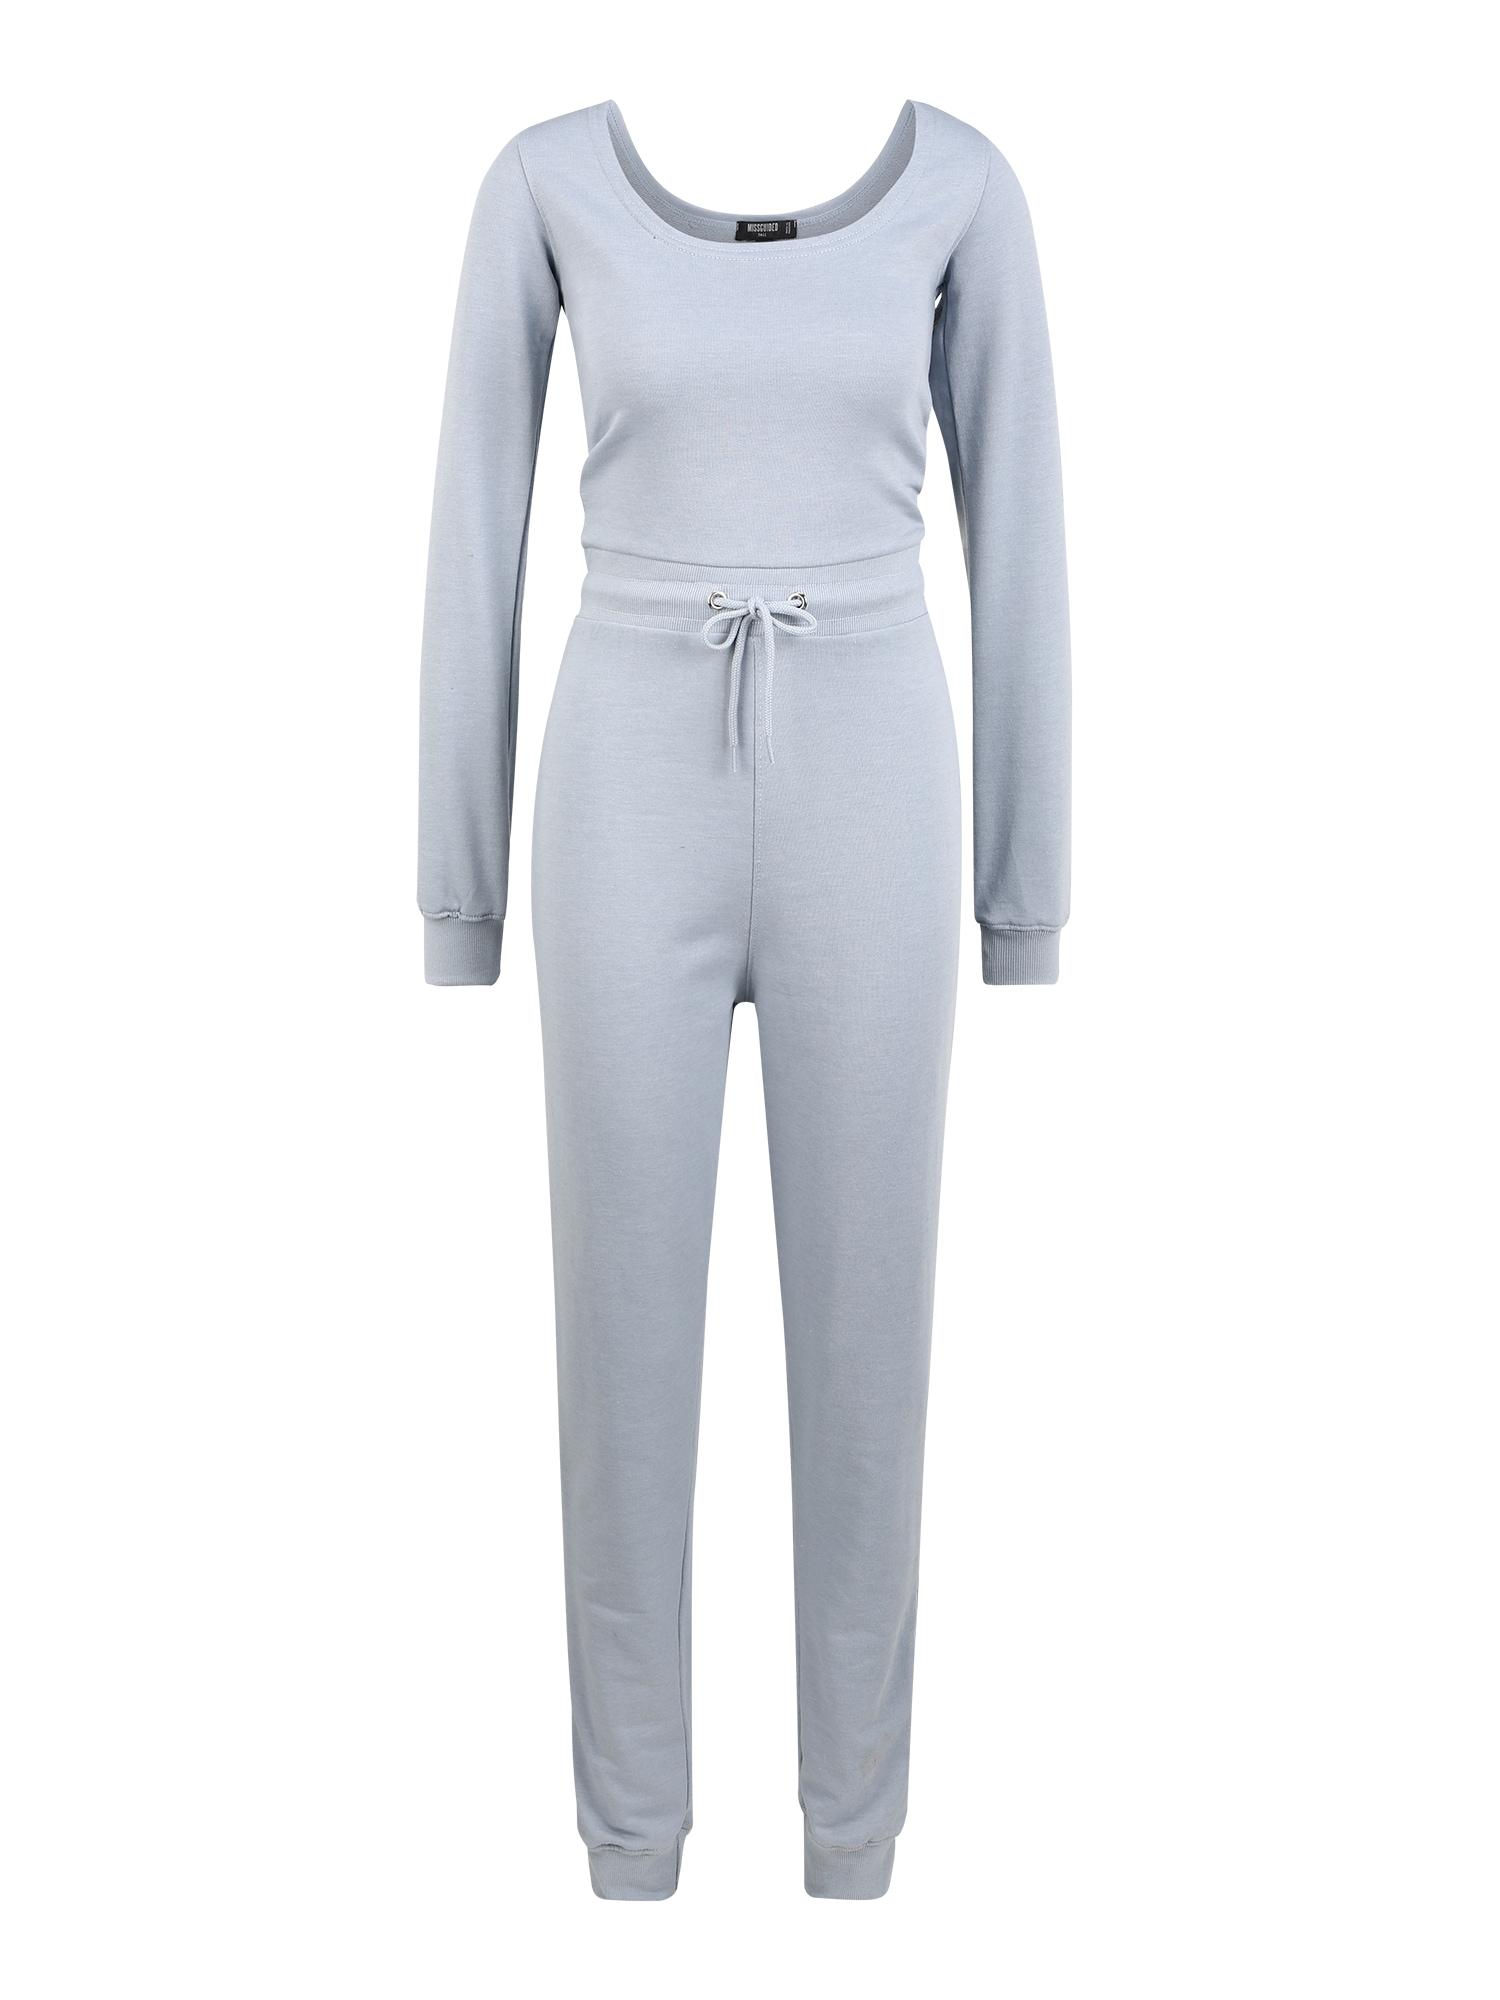 Missguided (Tall) Vienos dalies kostiumas mėlyna dūmų spalva